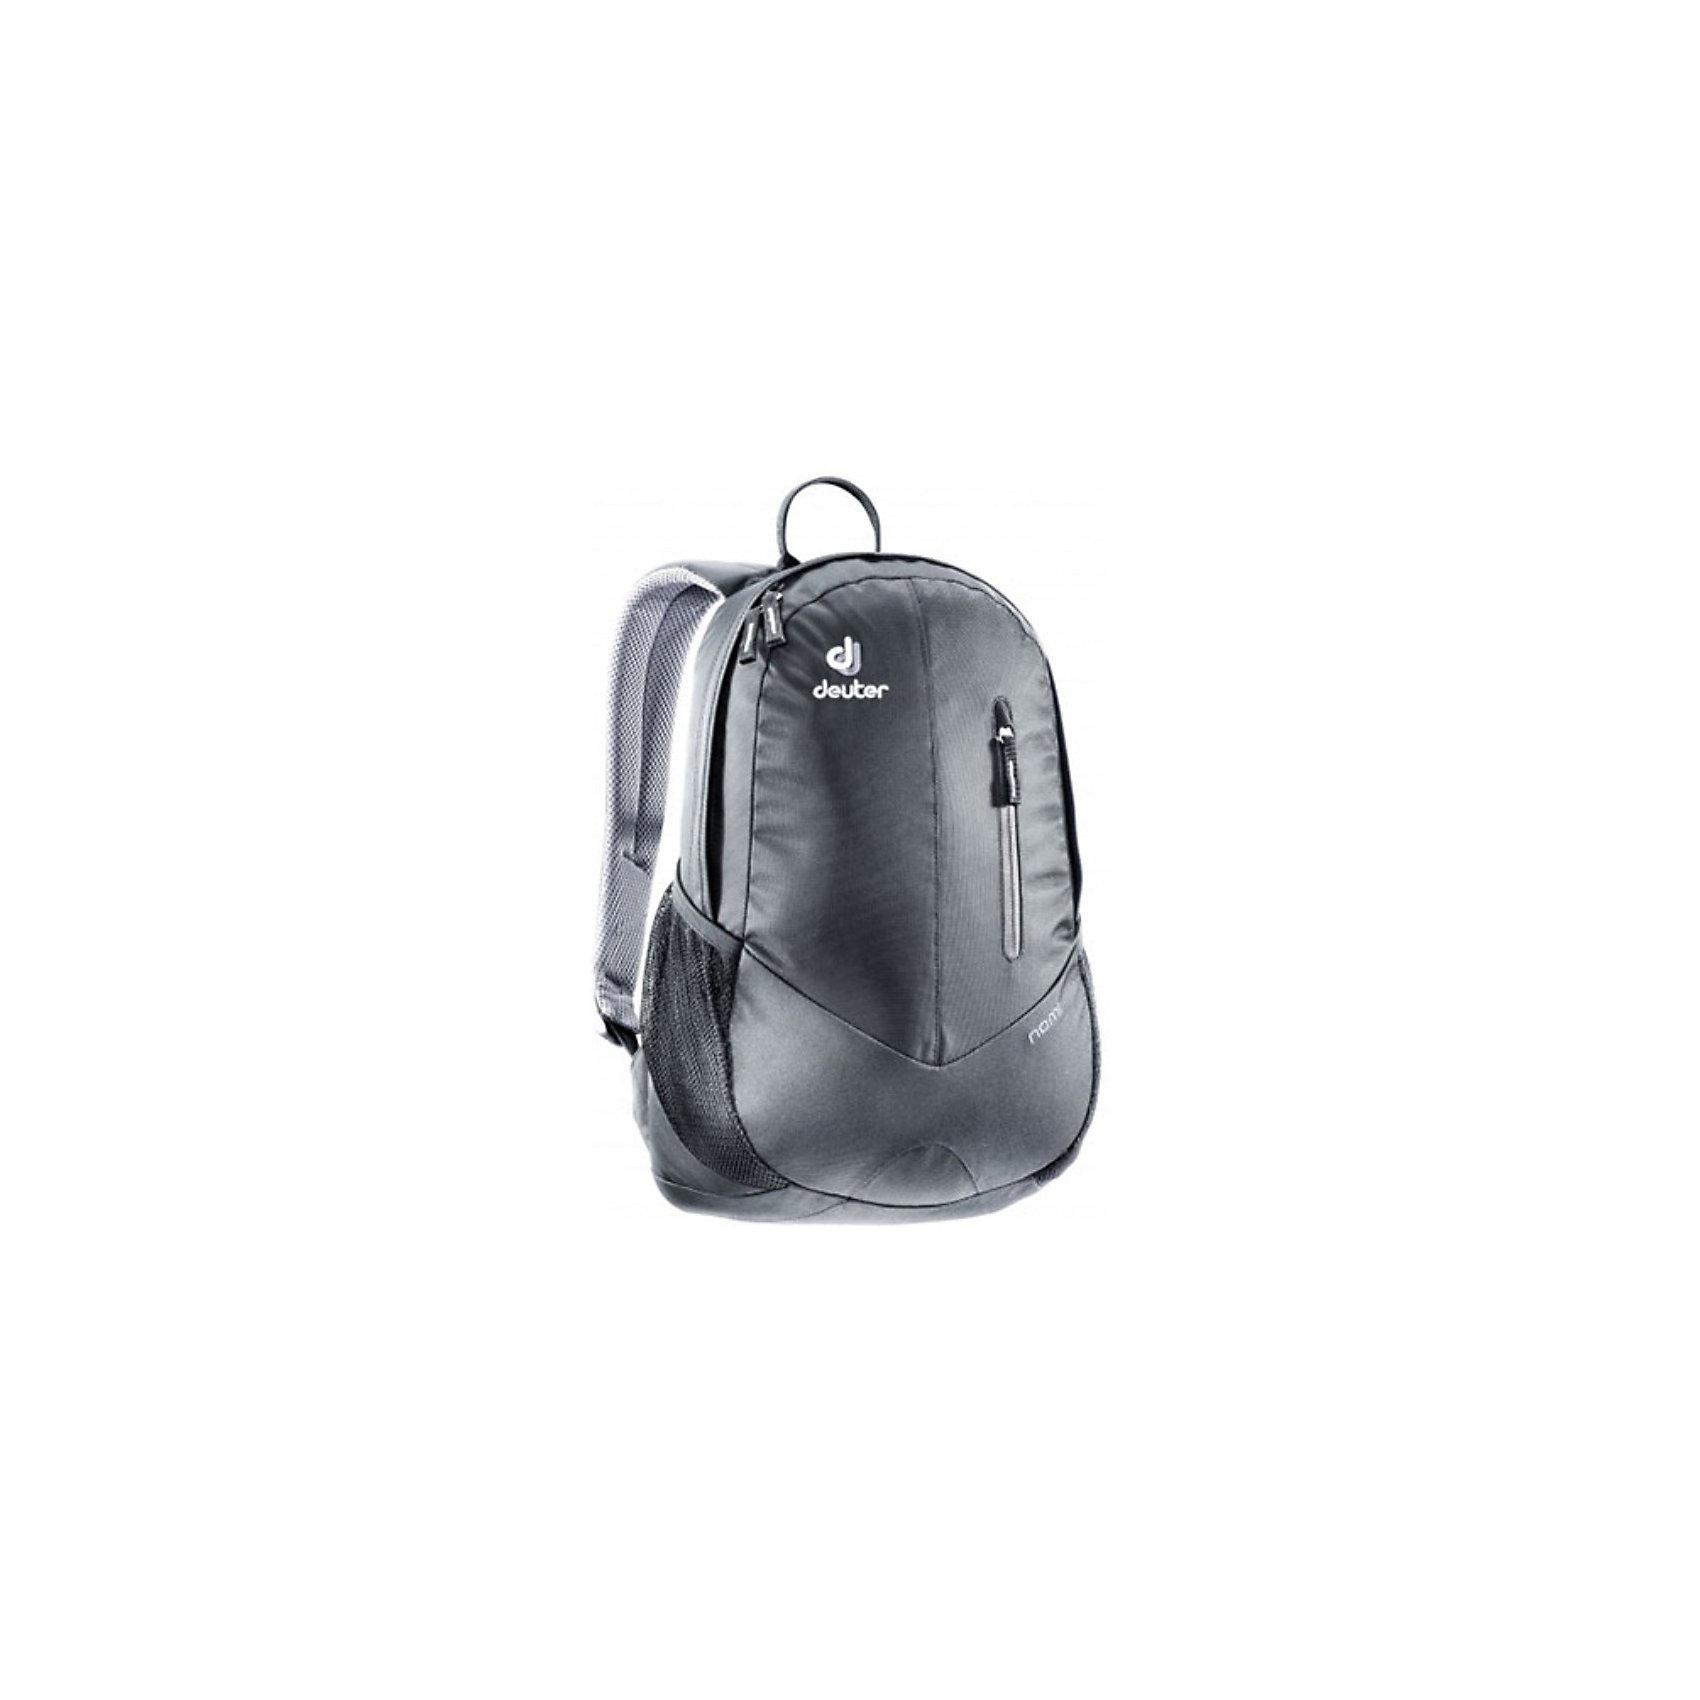 Deuter Школьный рюкзак Nomi, Deuter рюкзак deuter daypacks giga kiwi emerald